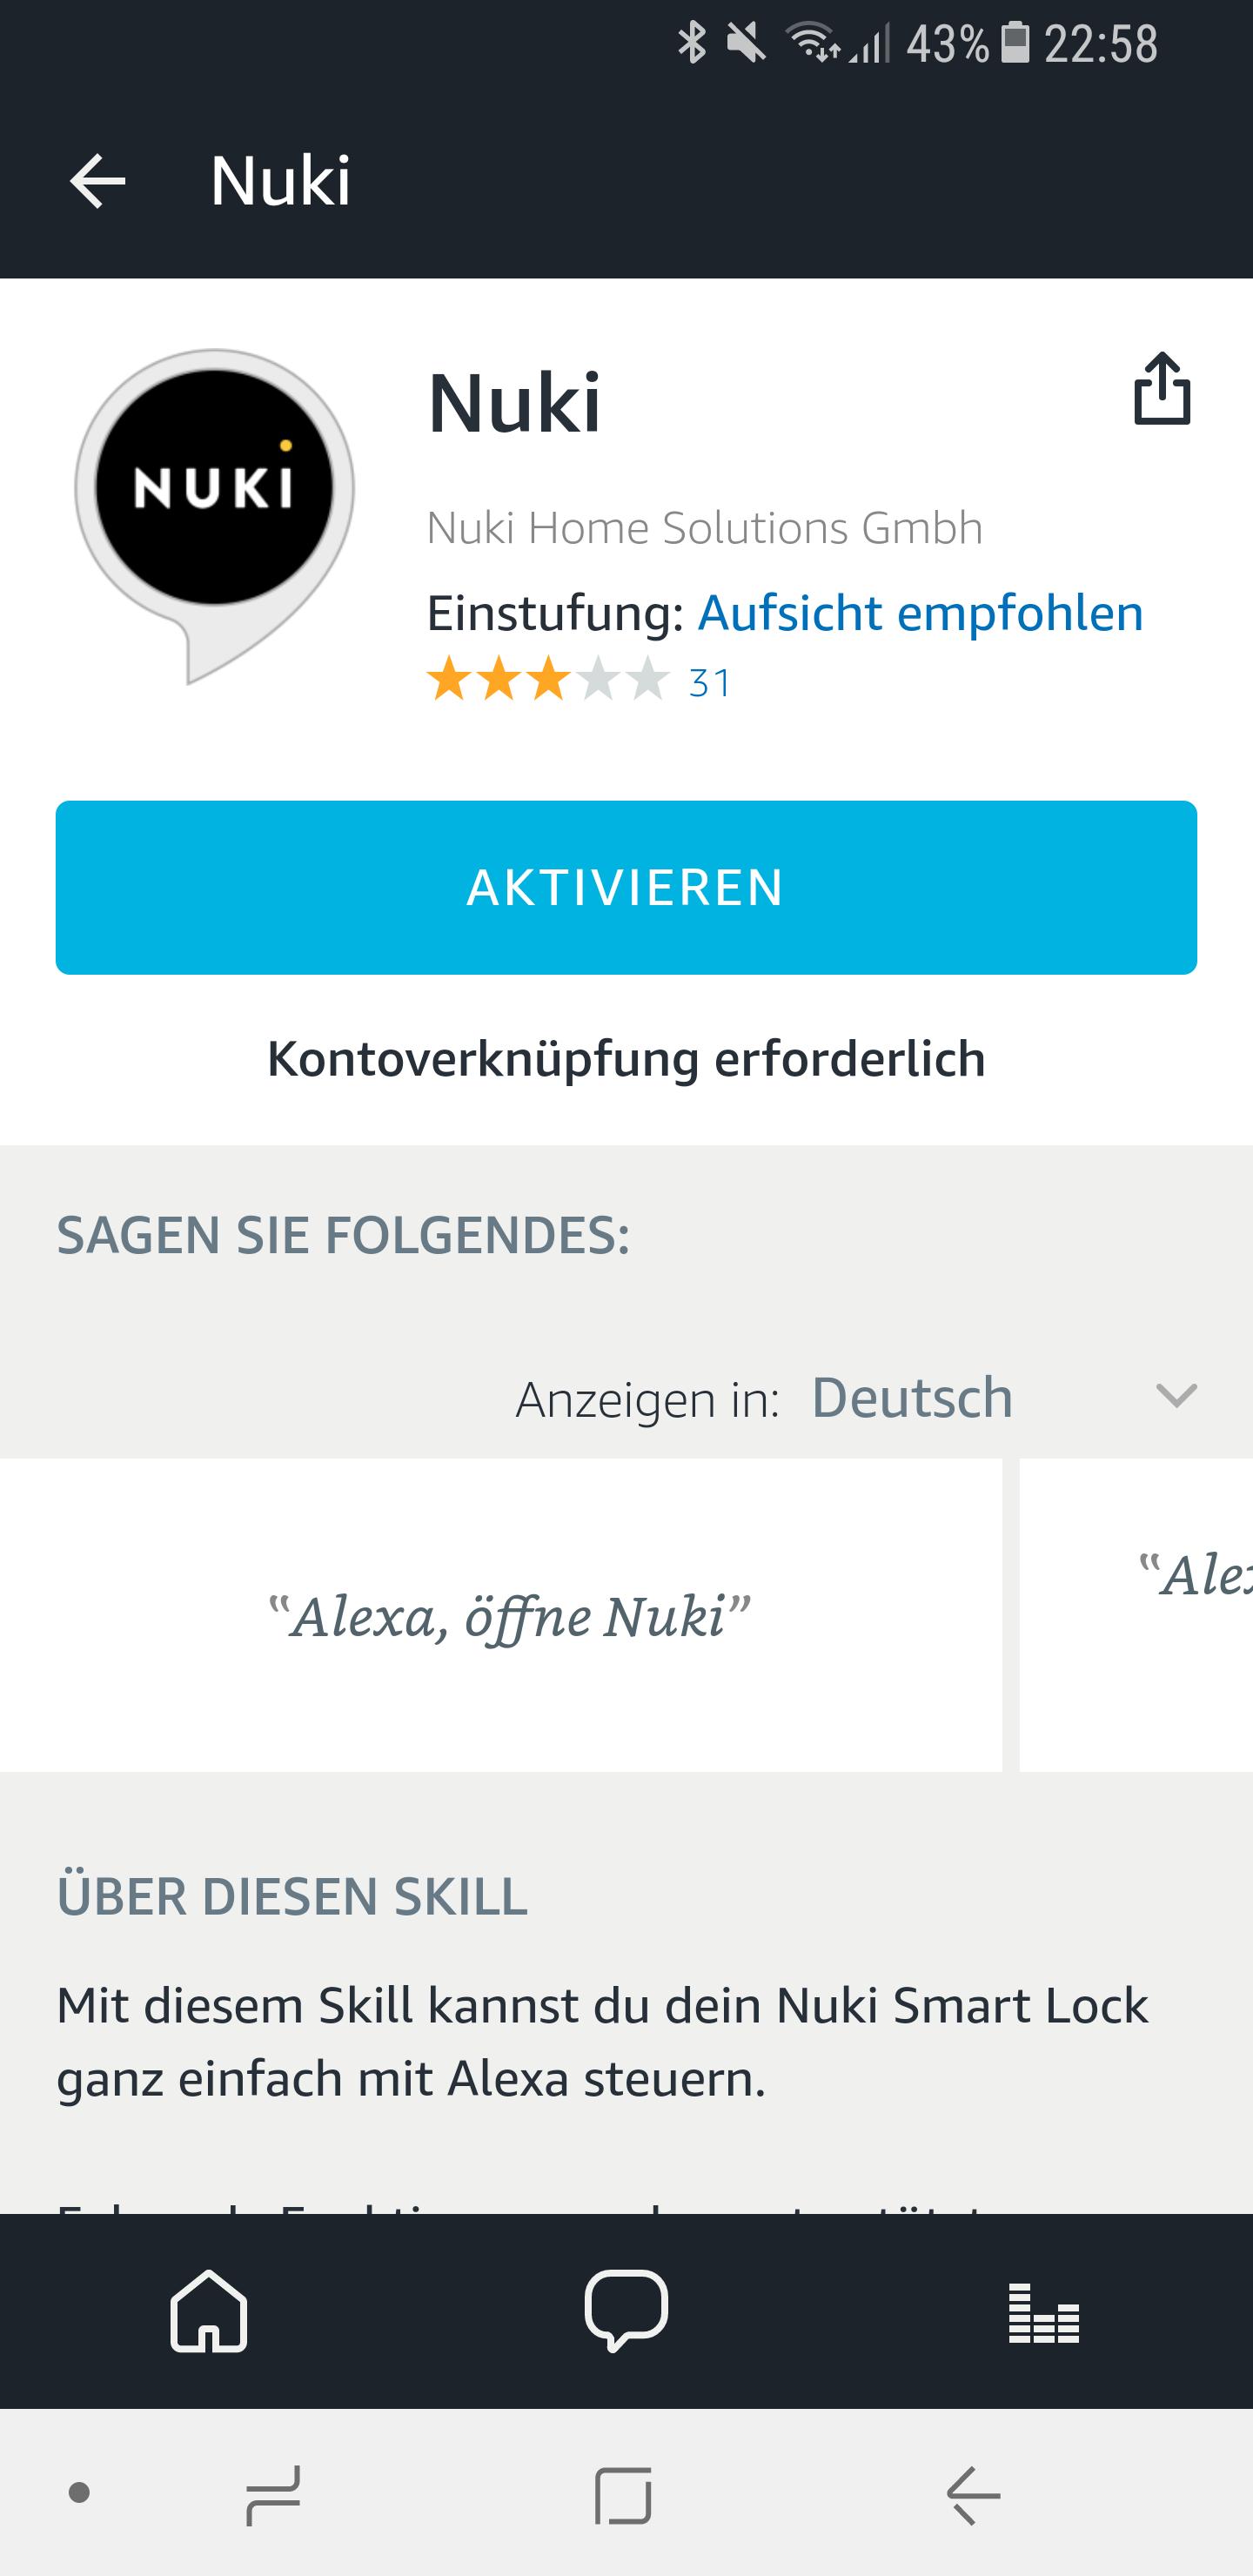 Nuki mit Alexa verbinden 10